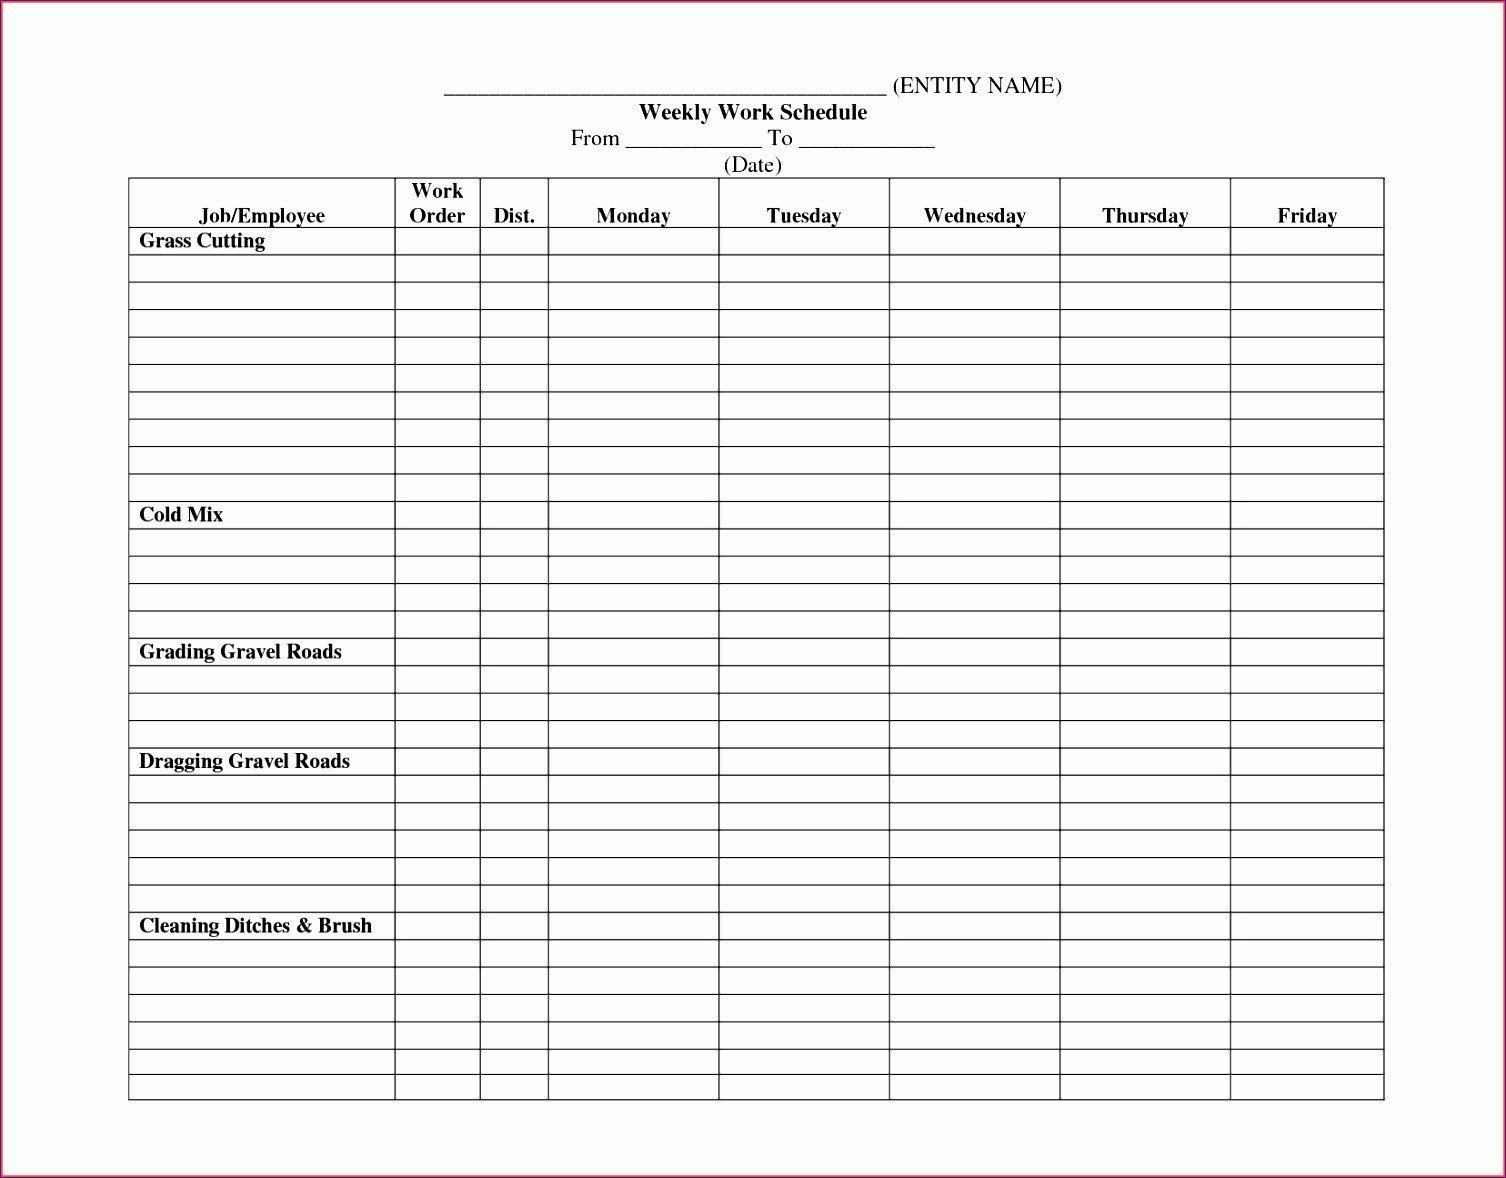 Staffing Plan Template Excel 12 Staffing Schedule Template Excel Free Exceltemplates